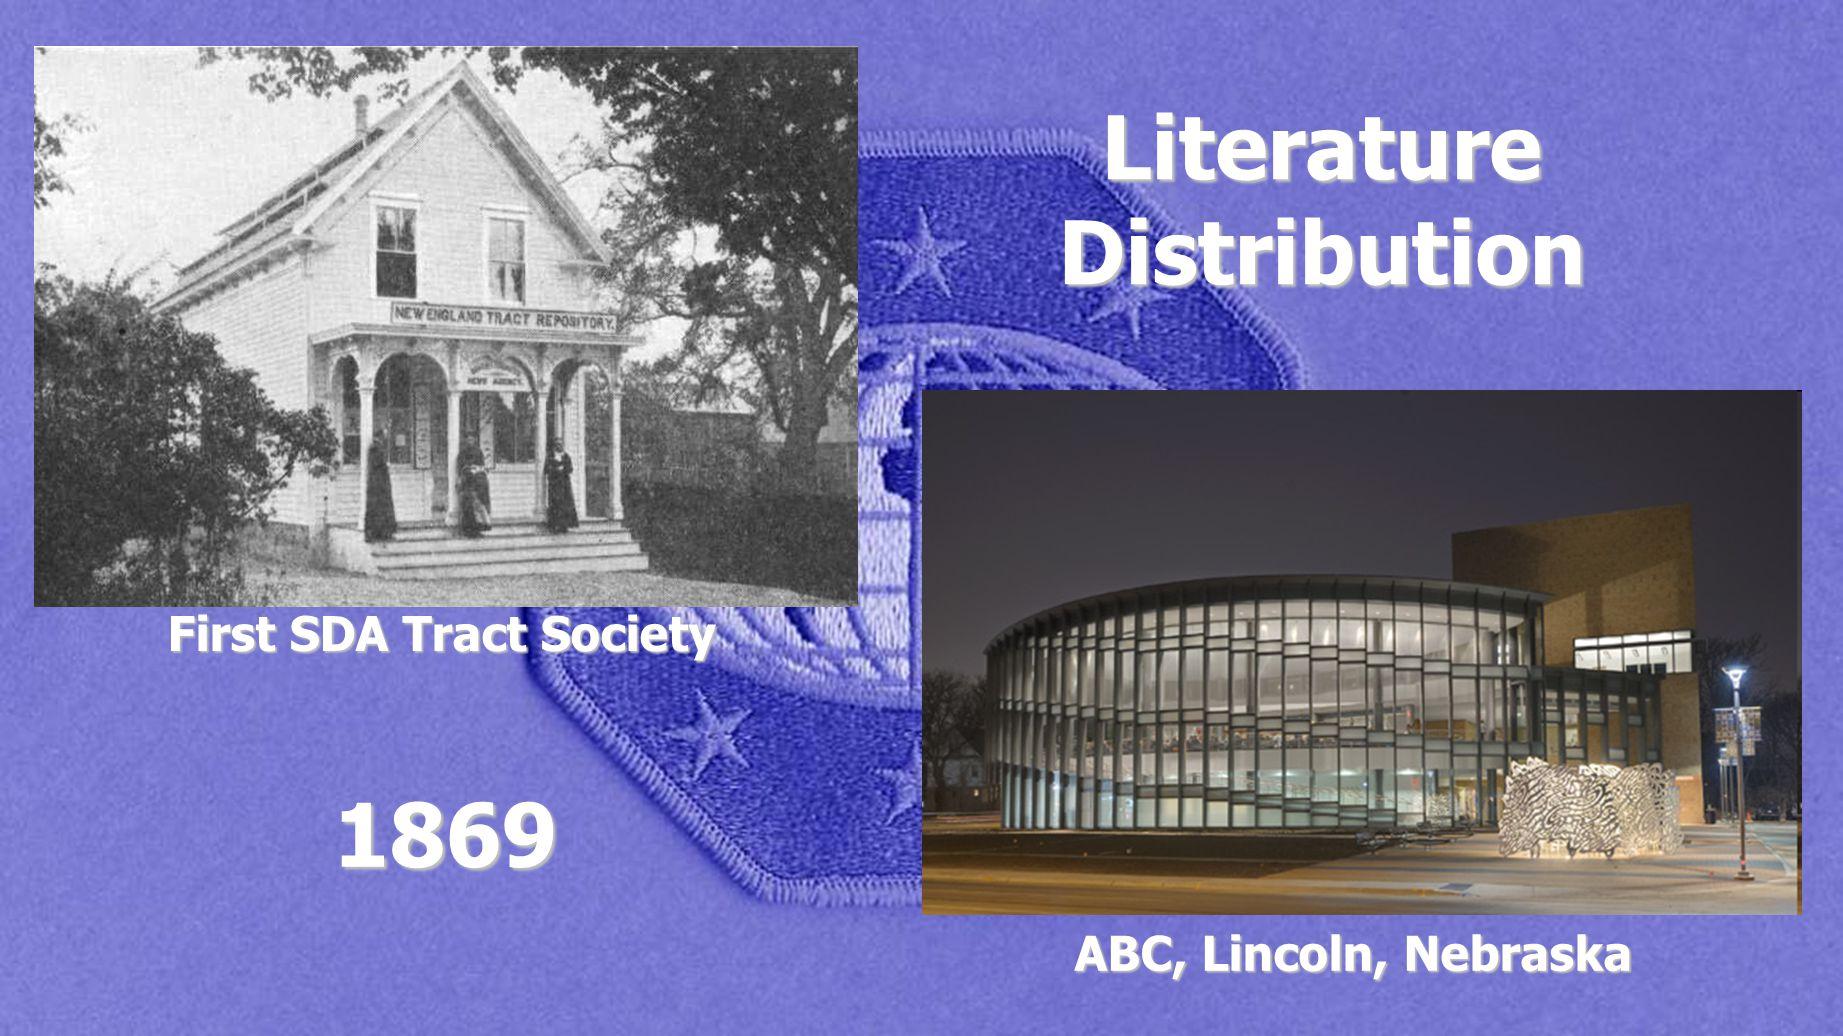 First SDA Tract Society ABC, Lincoln, Nebraska Literature Distribution 1869